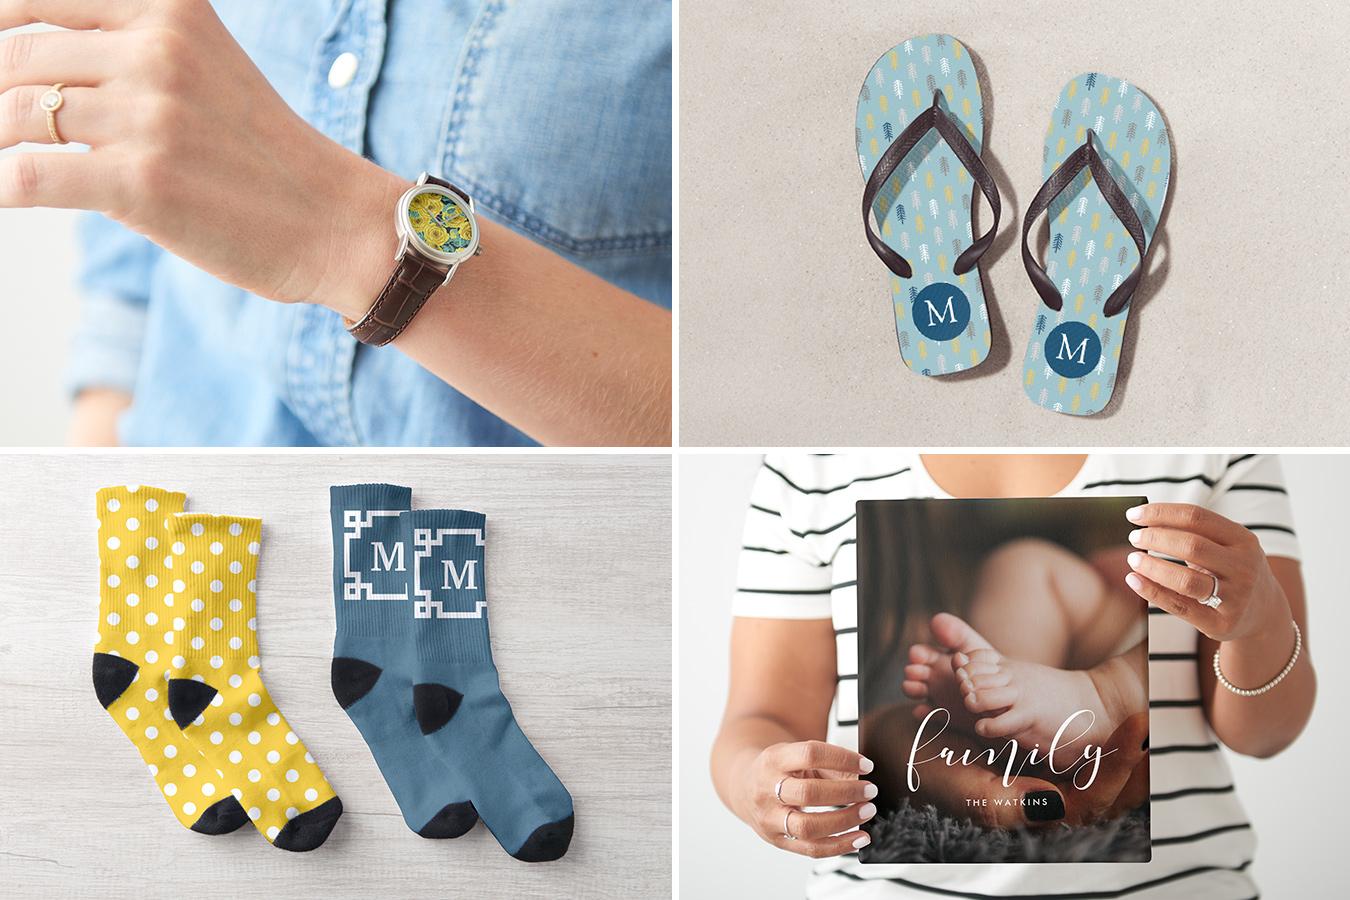 Christmas Gift Ideas 2019 Diy.Unique Diy Christmas Gift Ideas Zazzle Ideas